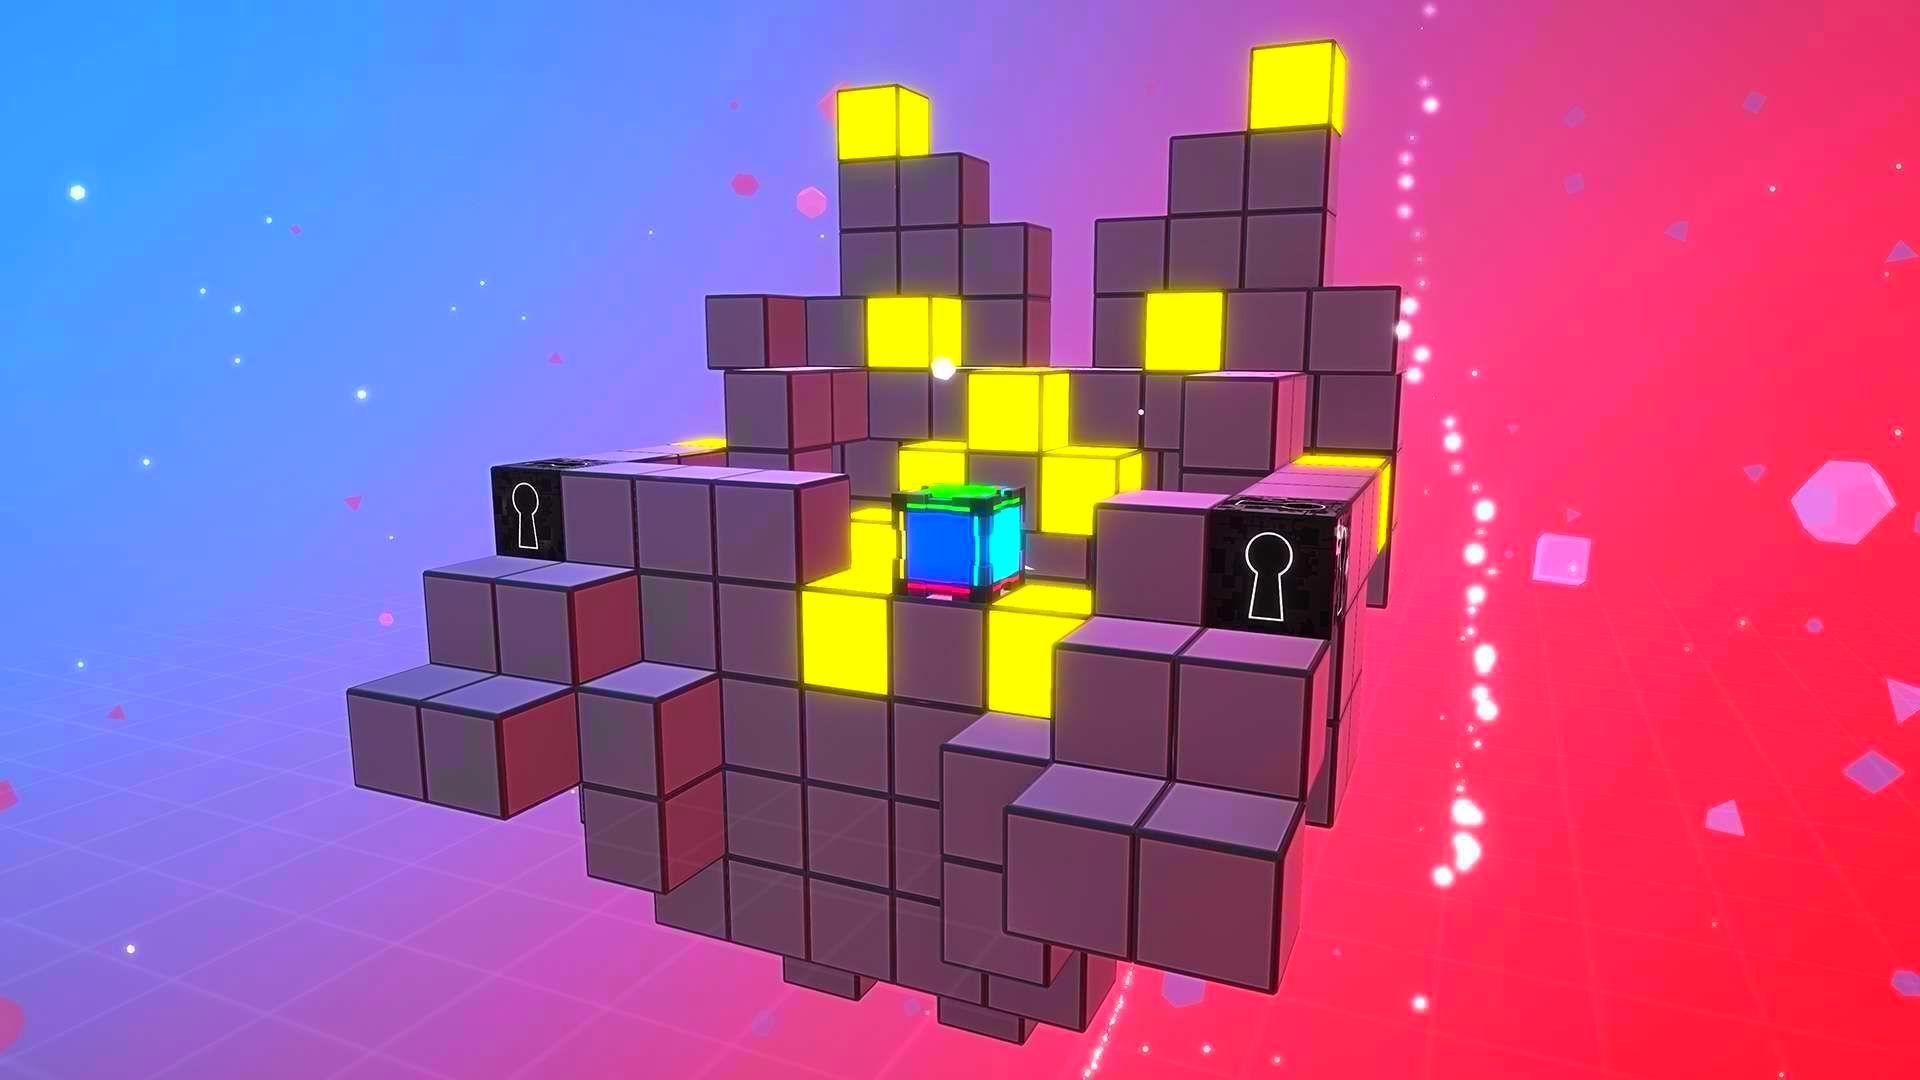 fractalbox_cubikolor_screen_01.jpg